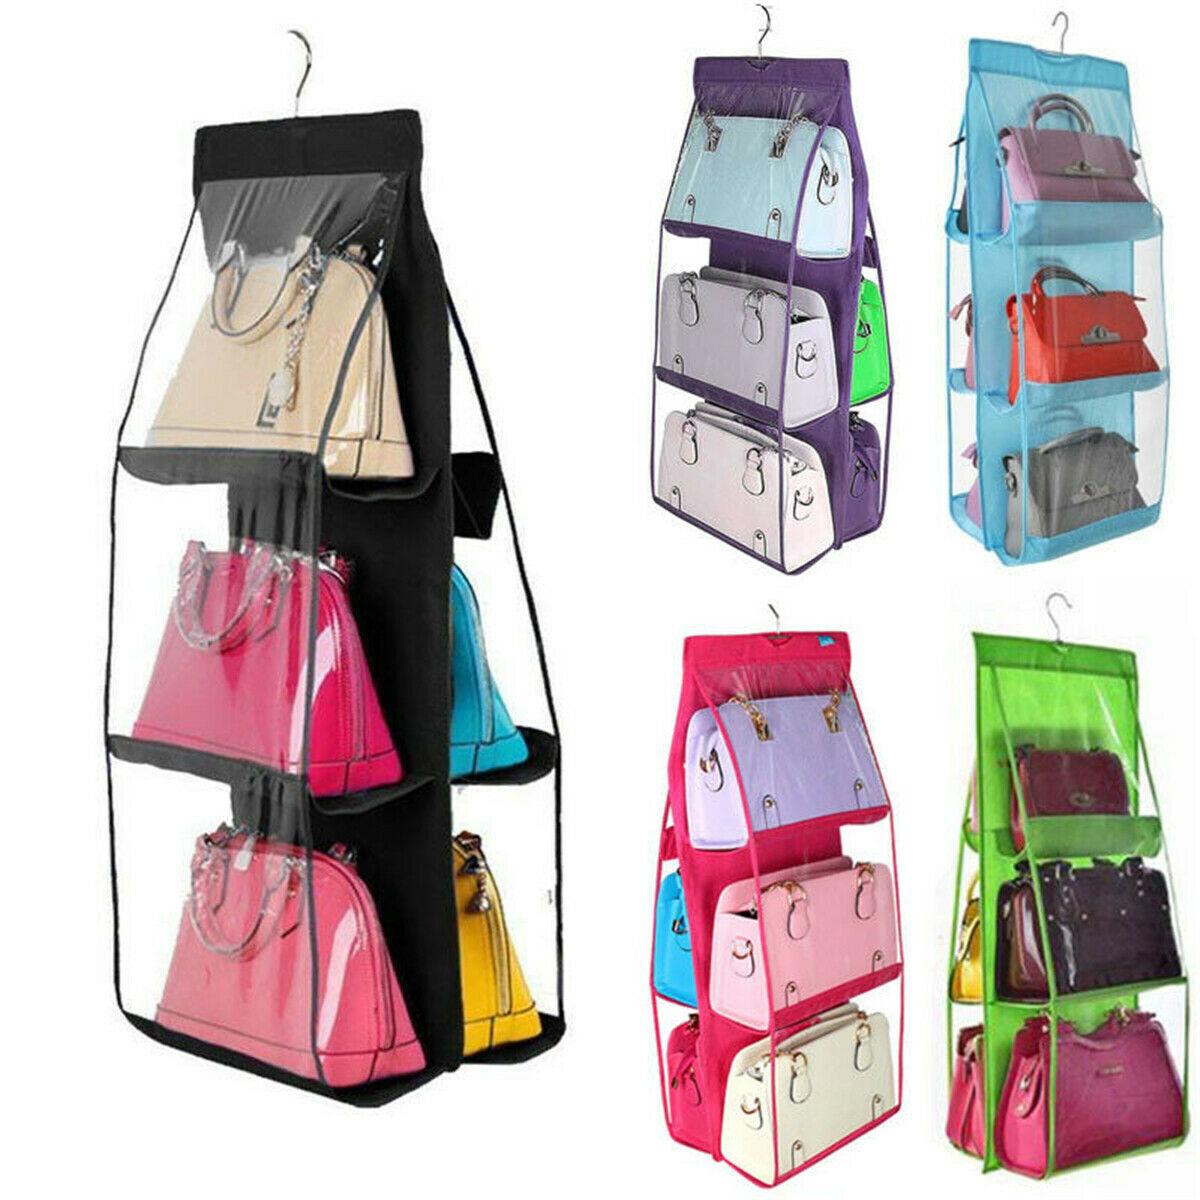 Hbf7961b9291d4234a58e0eda67c71ac8J - 6 Pocket Foldable Hanging Bag 3 Layers Folding Shelf Bag Purse Handbag Organizer Door Sundry Pocket Hanger Storage Closet Hanger